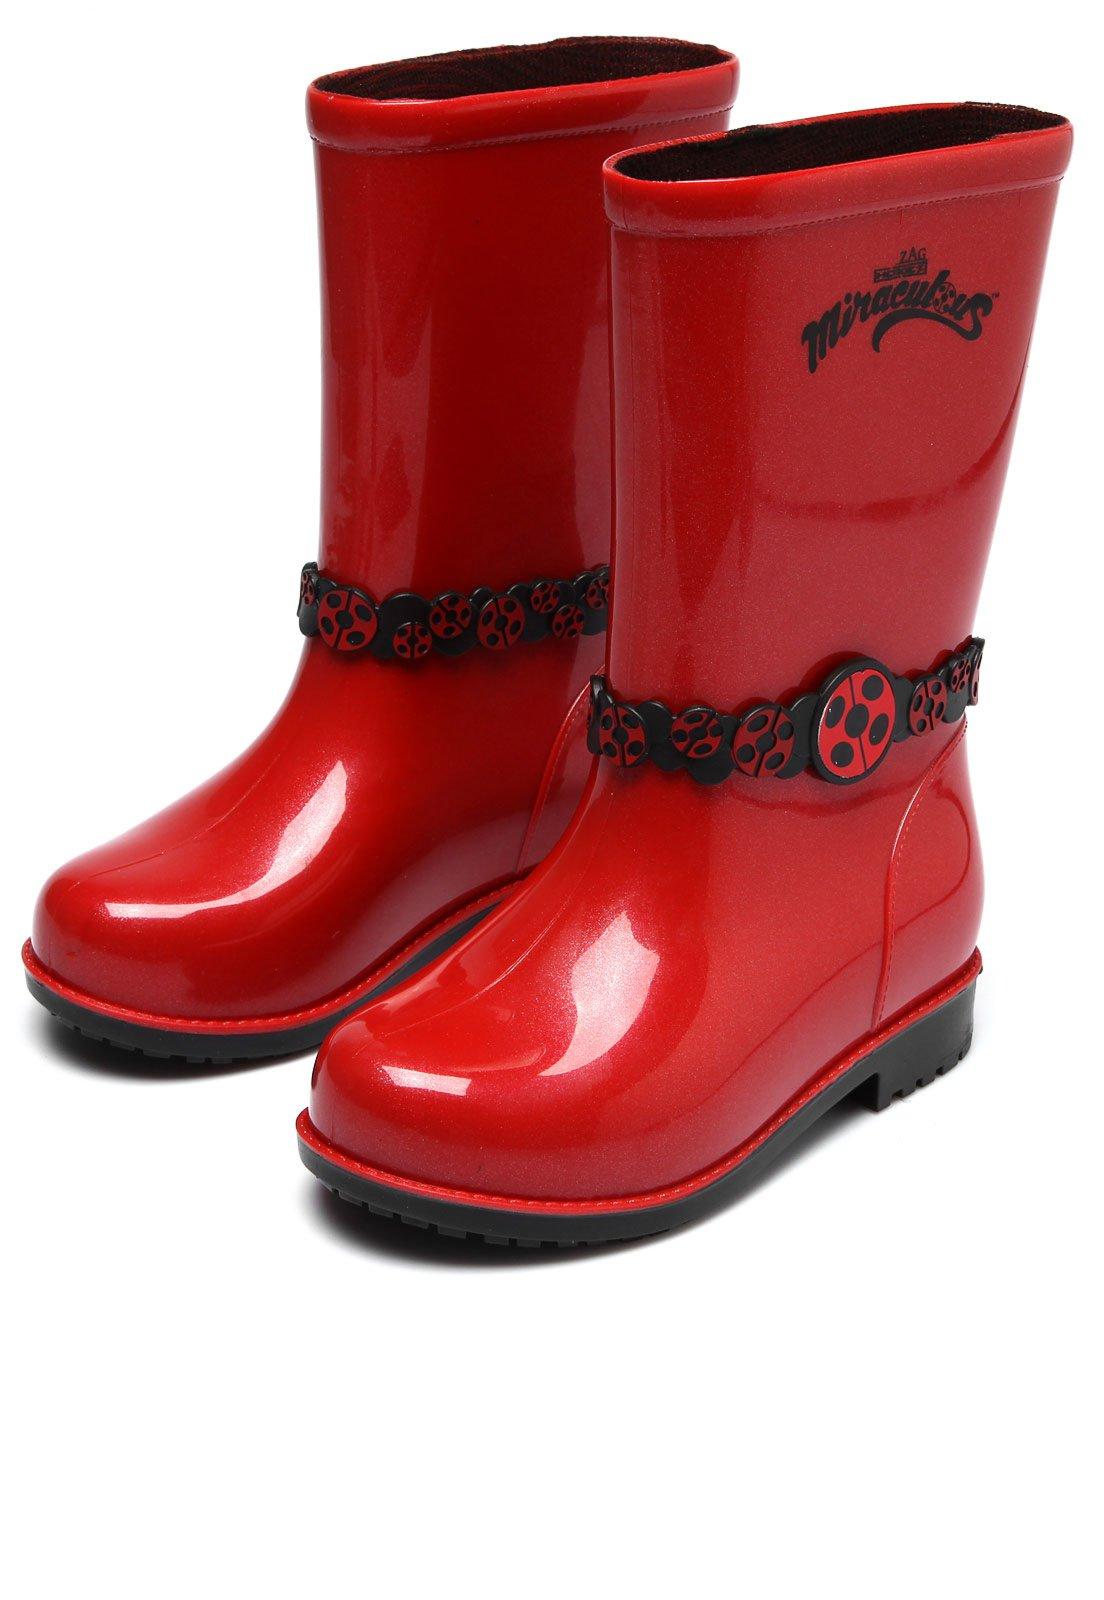 53ecd7b2330 Galocha Grendene Kids Ladybug Miraculous Vermelho - Compre Agora ...